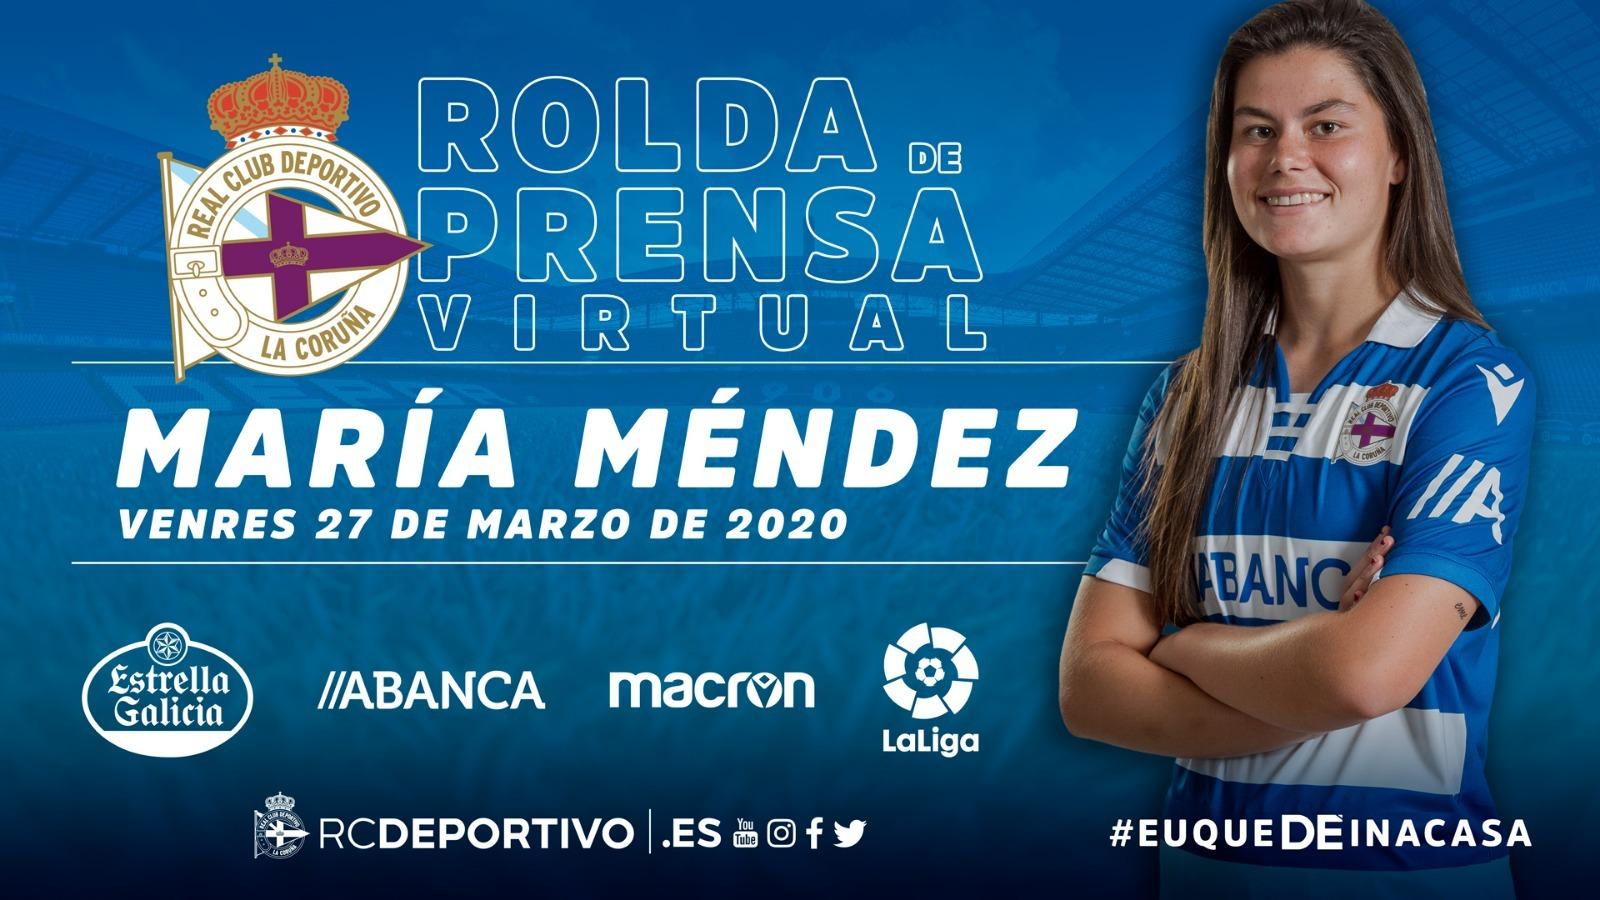 María Méndez, rolda de prensa virtual | RCD